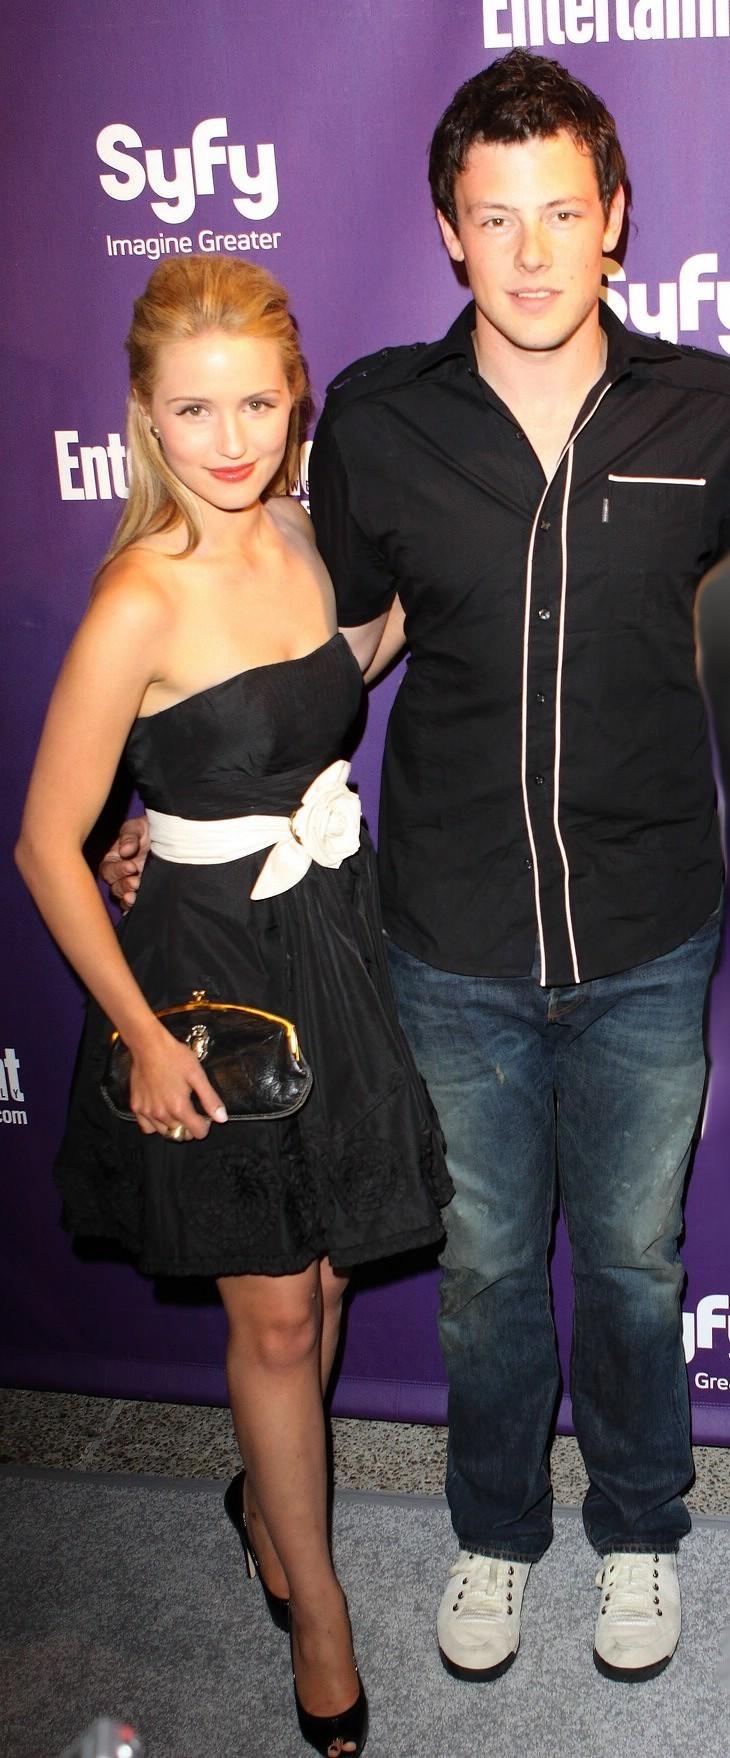 Naya Rivera Parents Divorced Cory Monteith | Dianna...